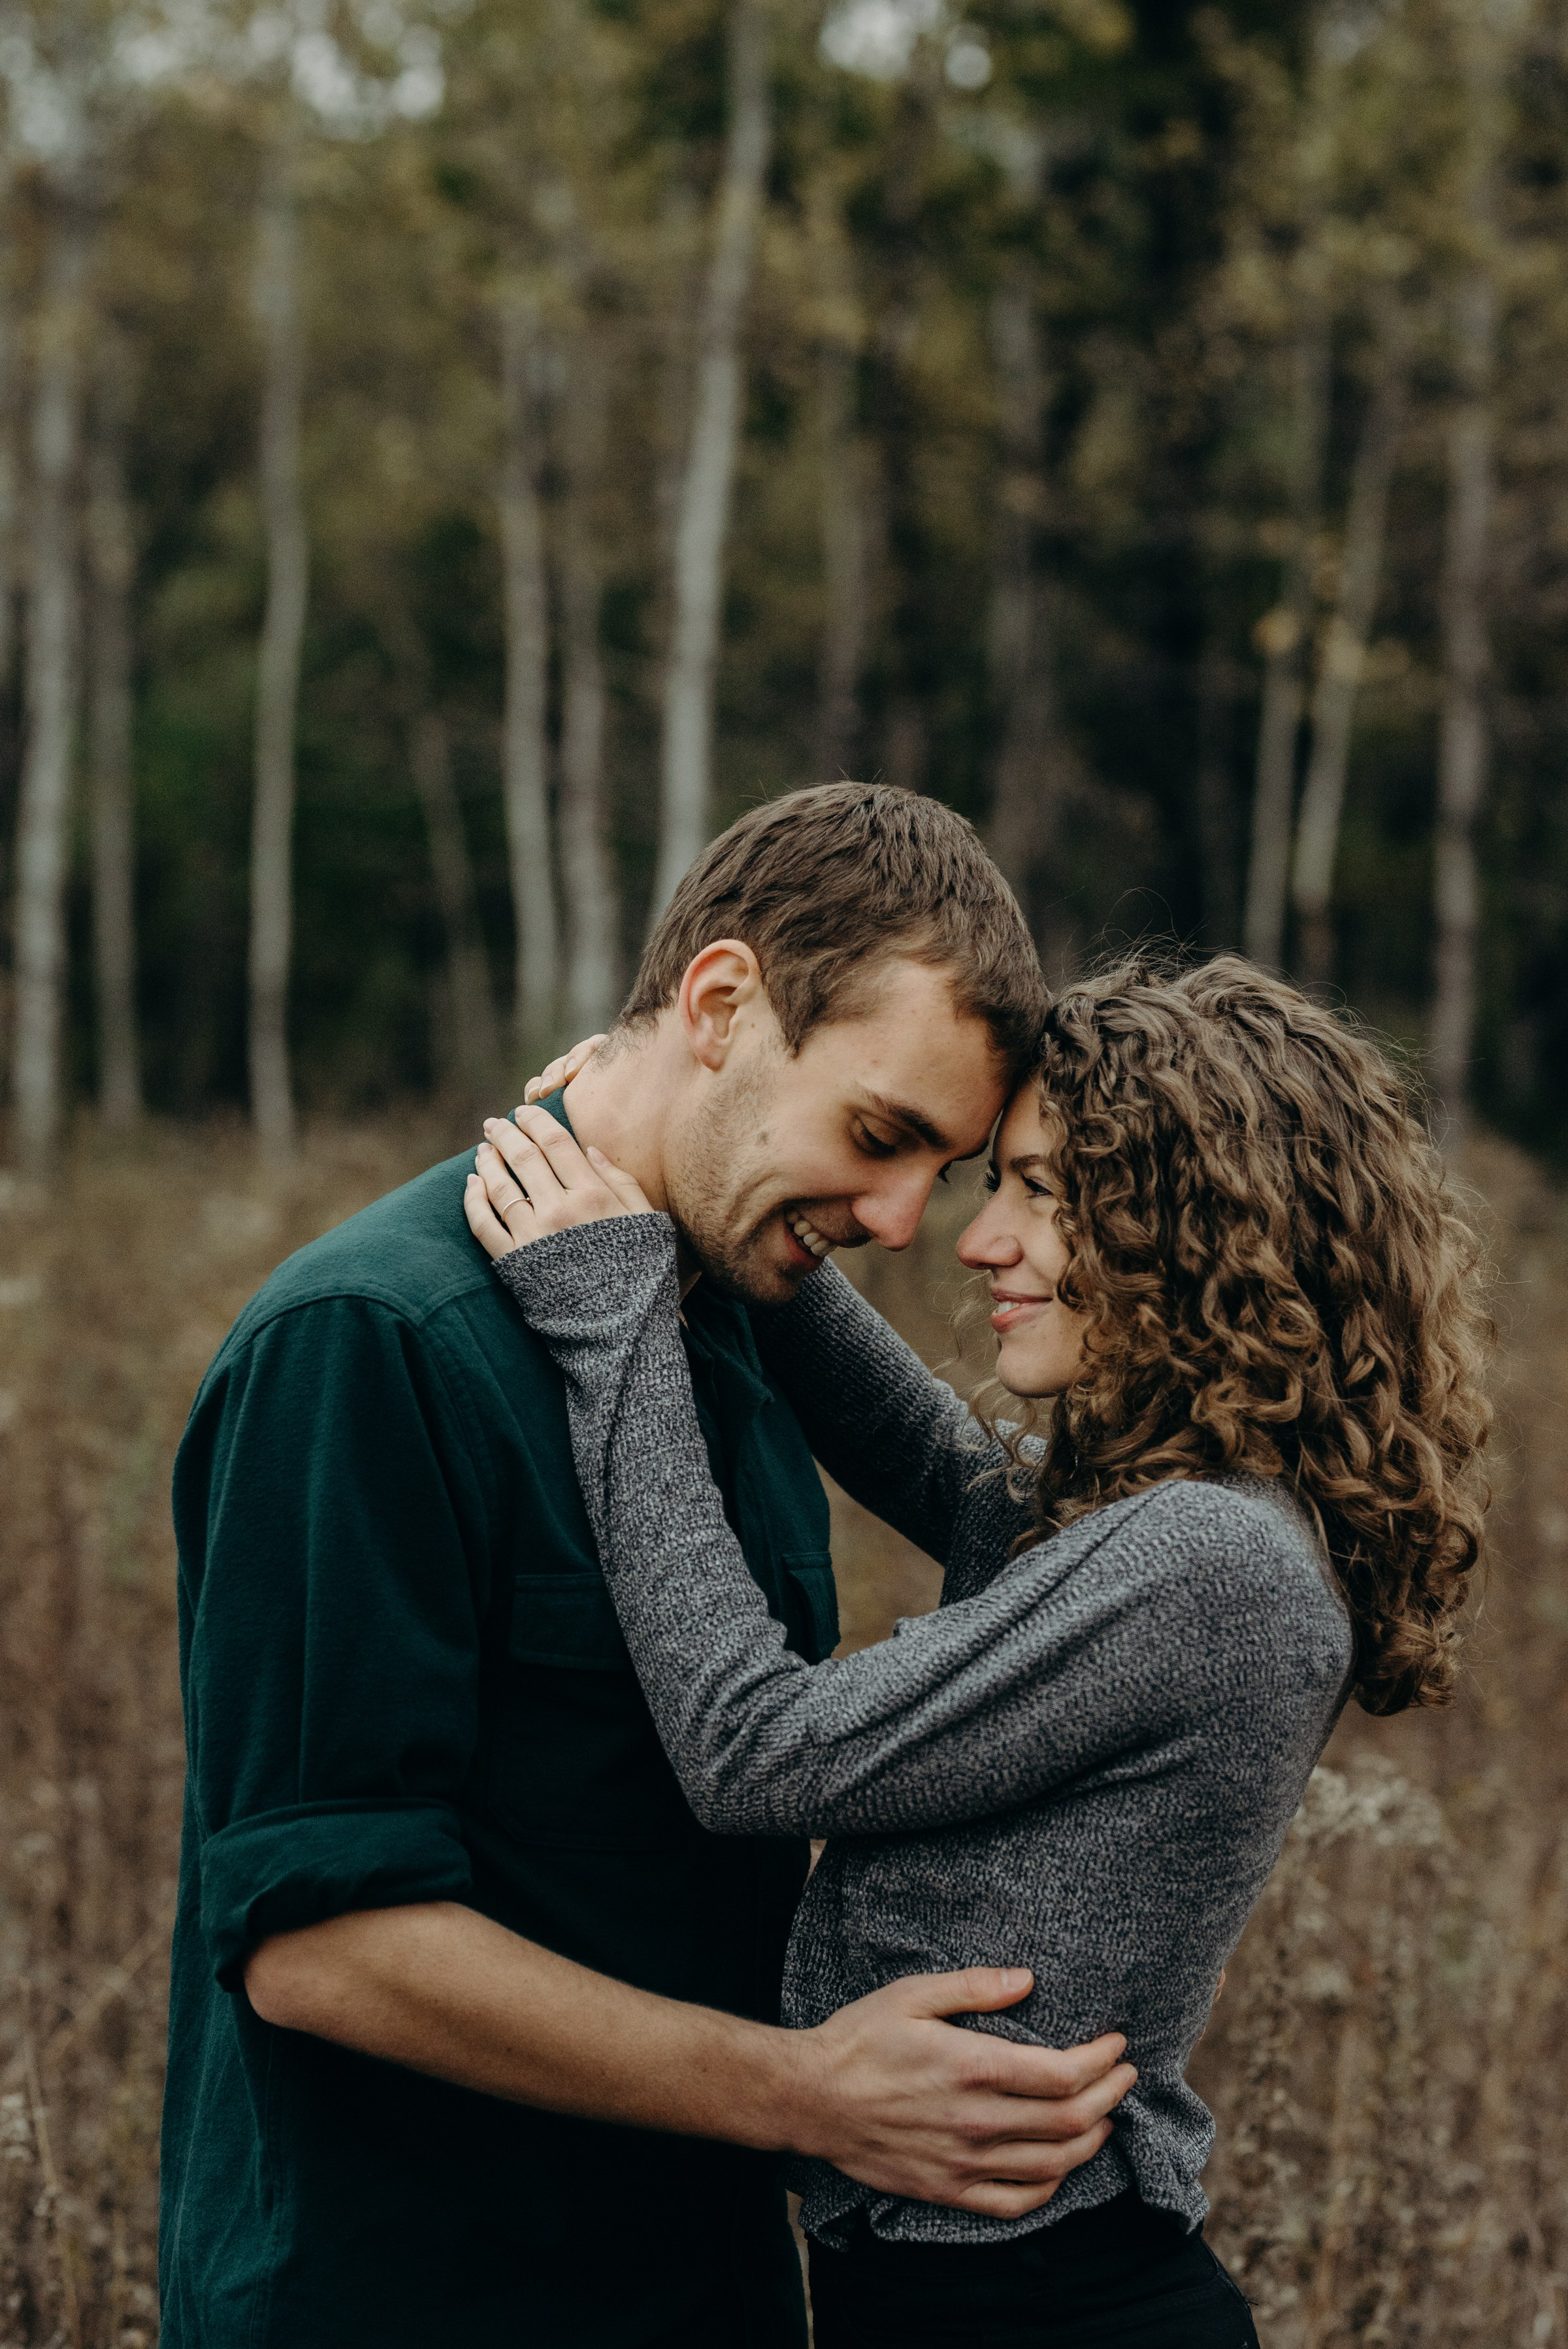 nickmezaphotography-austin-minneapolis-wedding-photographer-elopement-best-intimate-adventurous-destination-texas-minnesota-engagement-jess-dan-spacesaver_0179.jpg